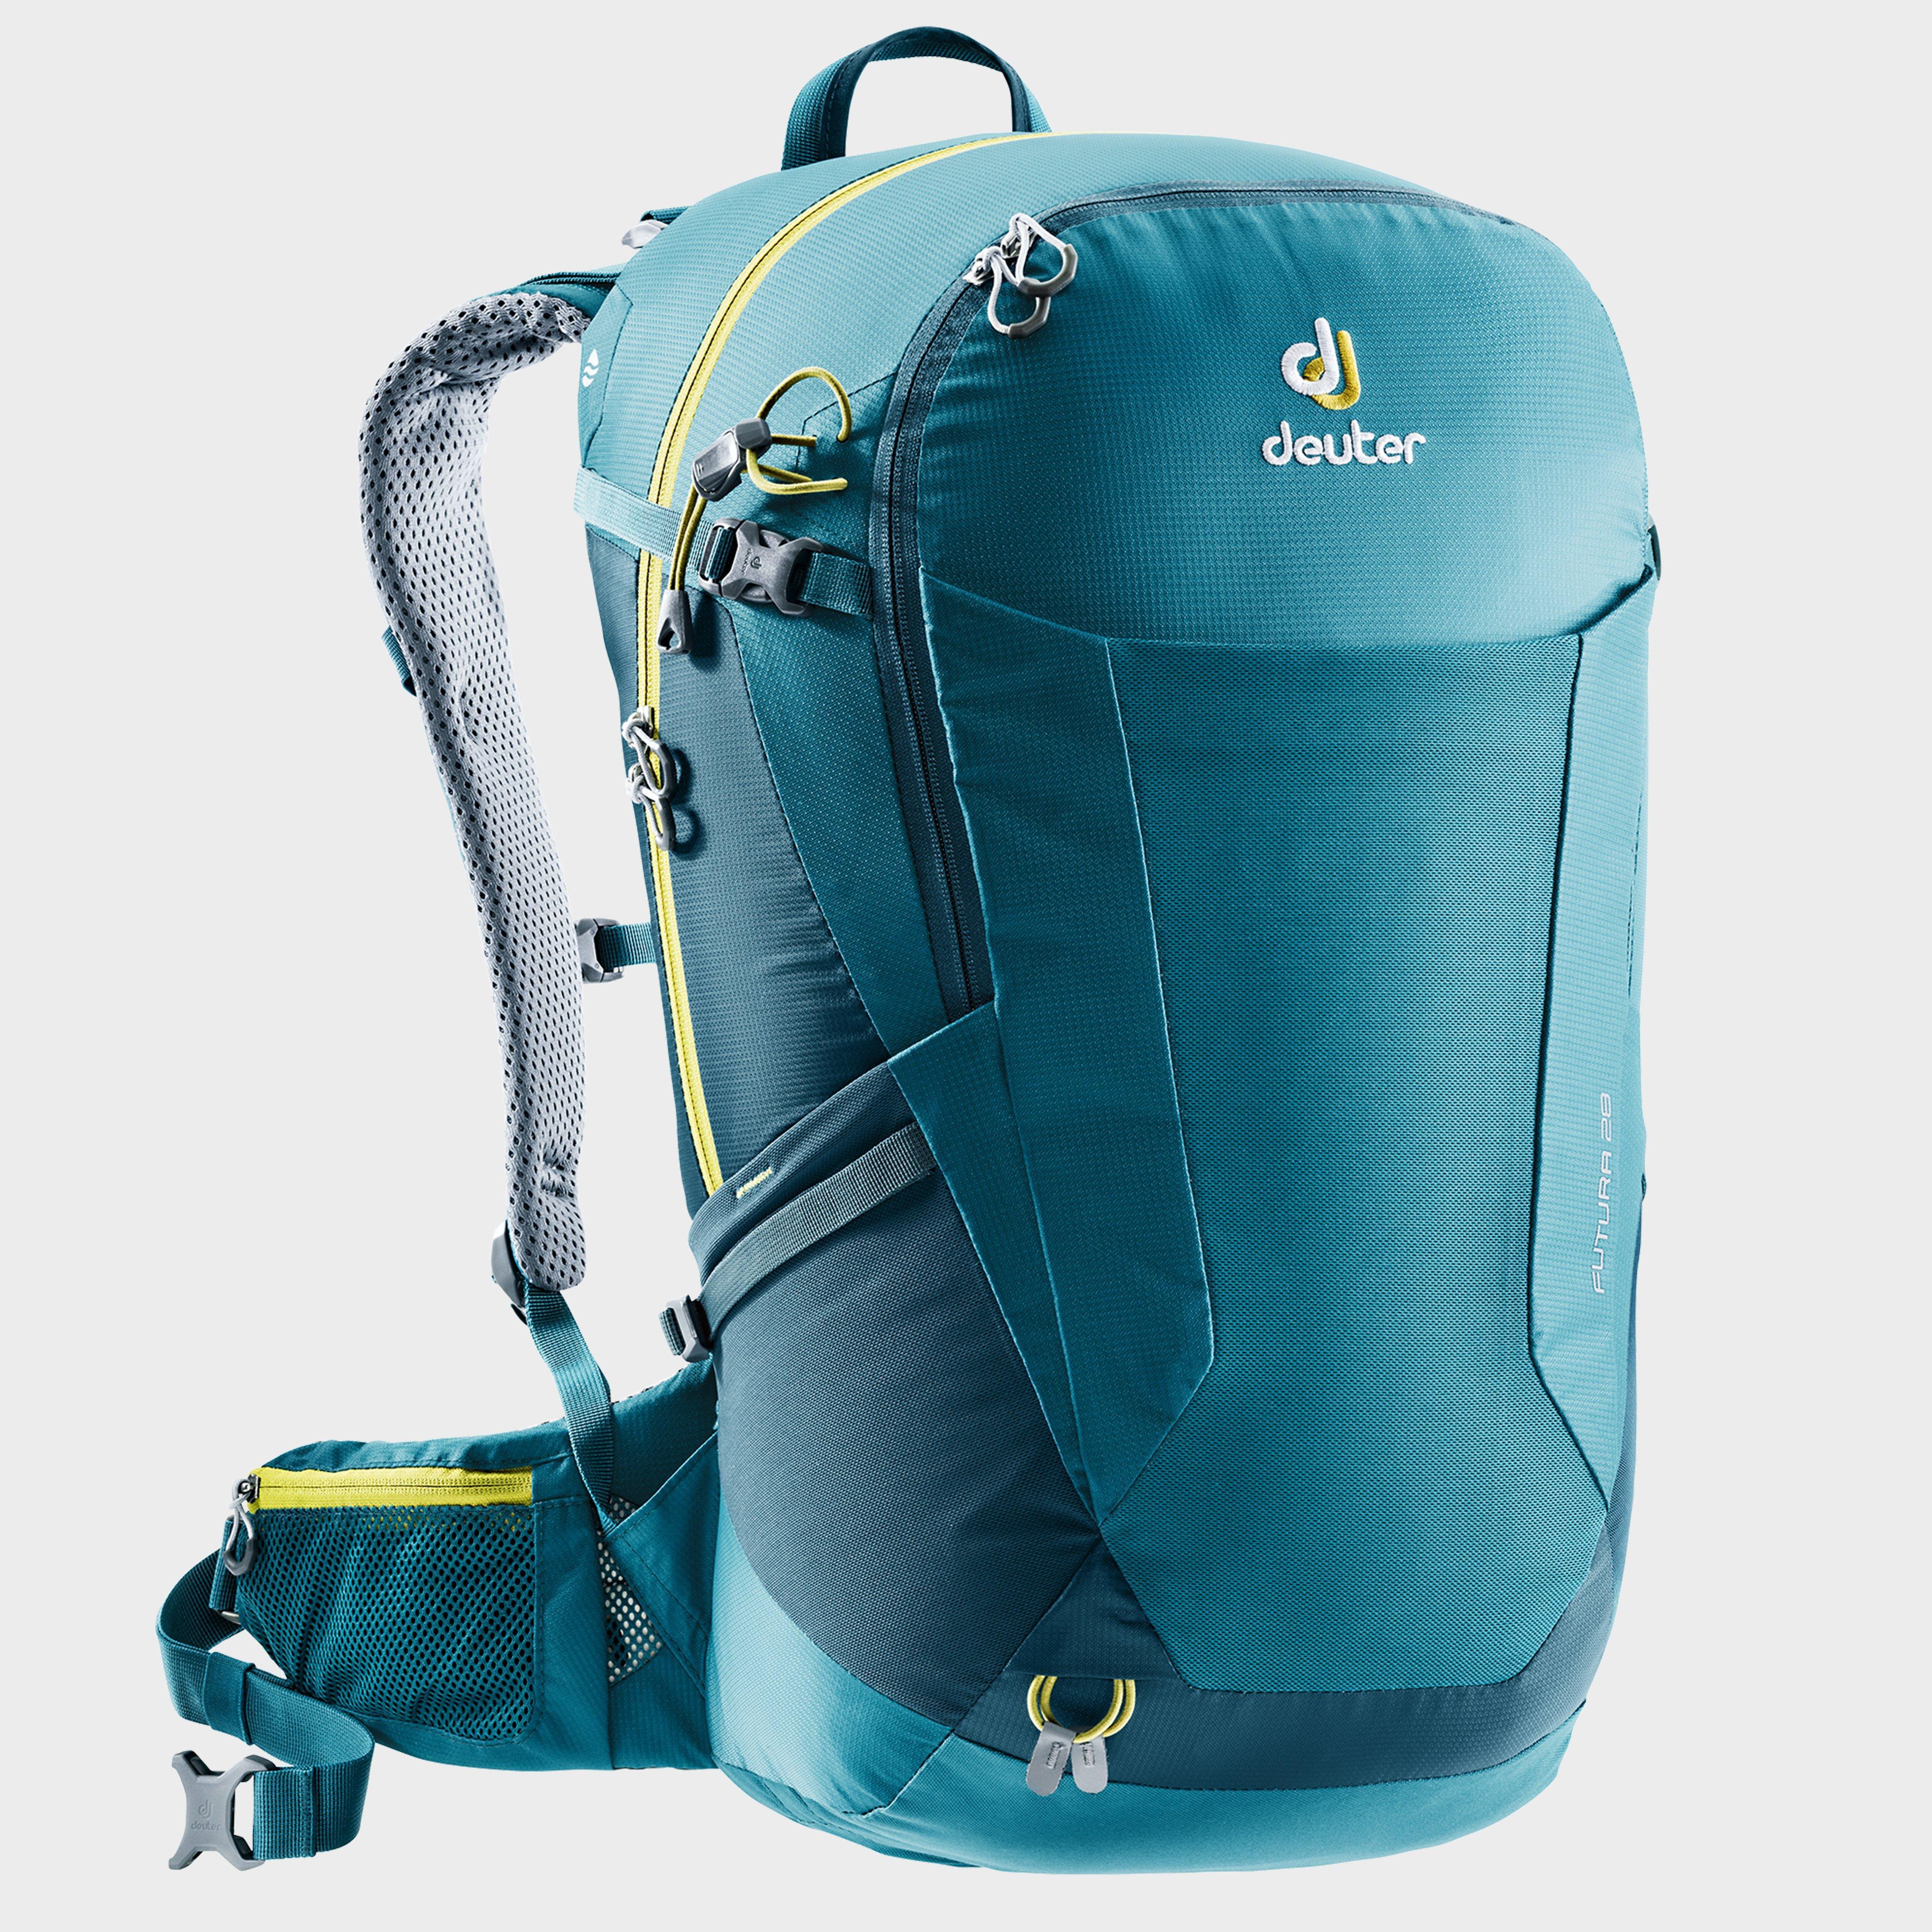 Deuter Futura 28L Daypack, Blue